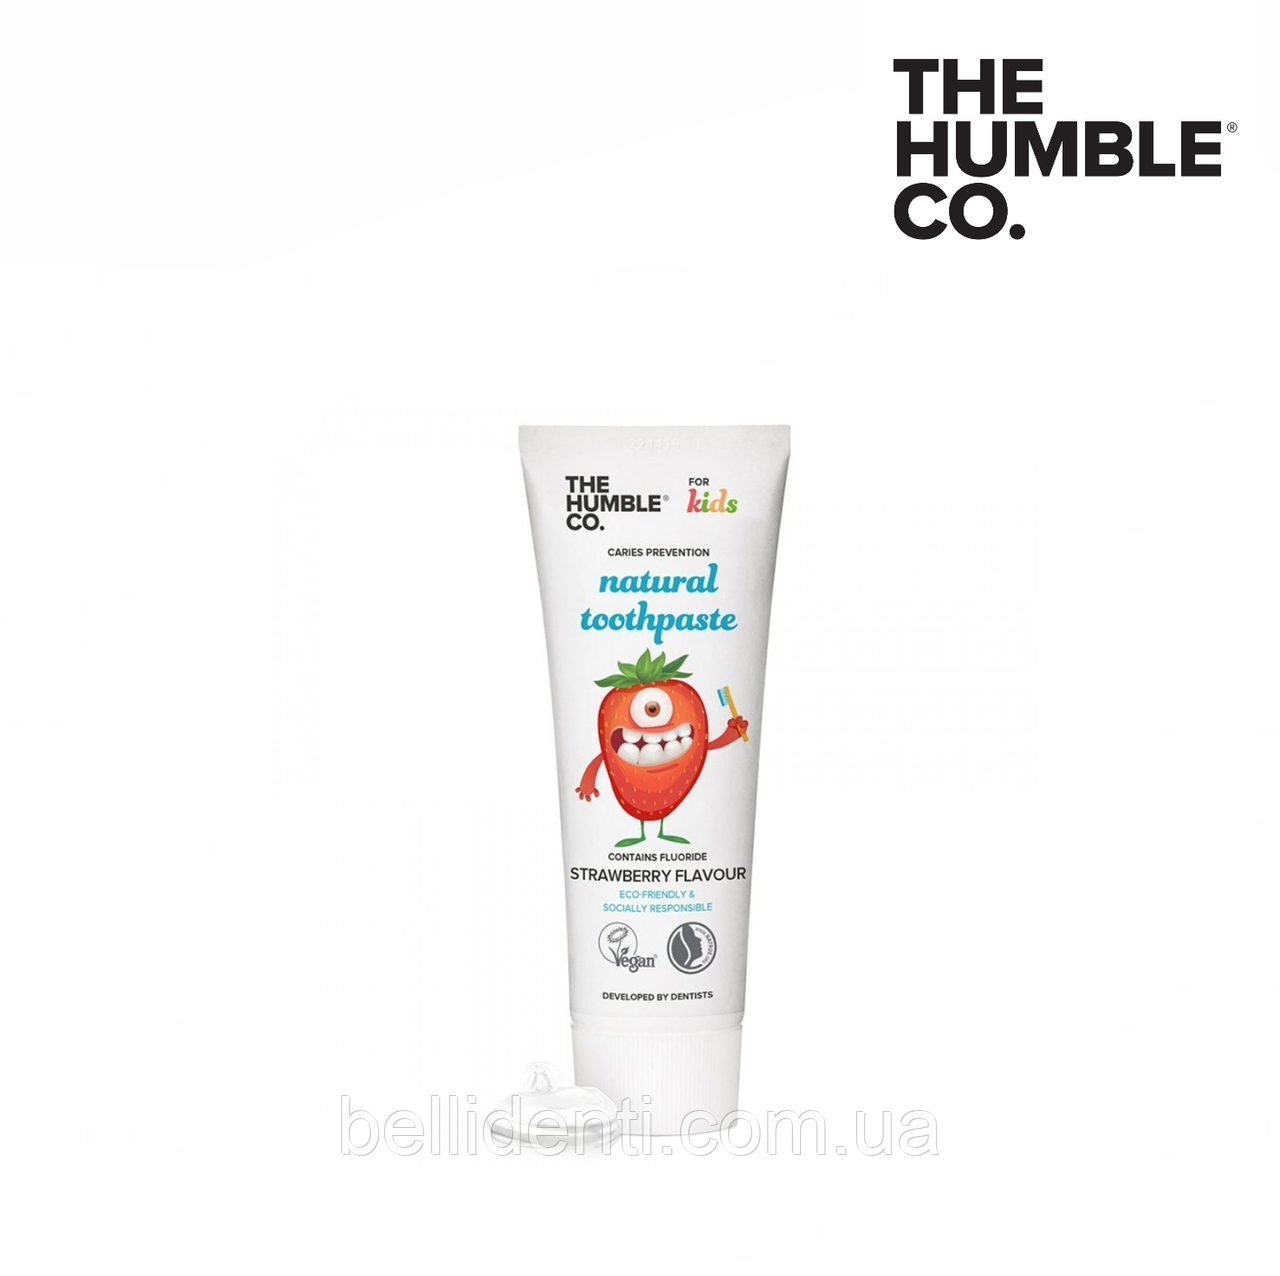 Детская натуральная зубная паста The Humble Co (вкус клубники), 75 мл